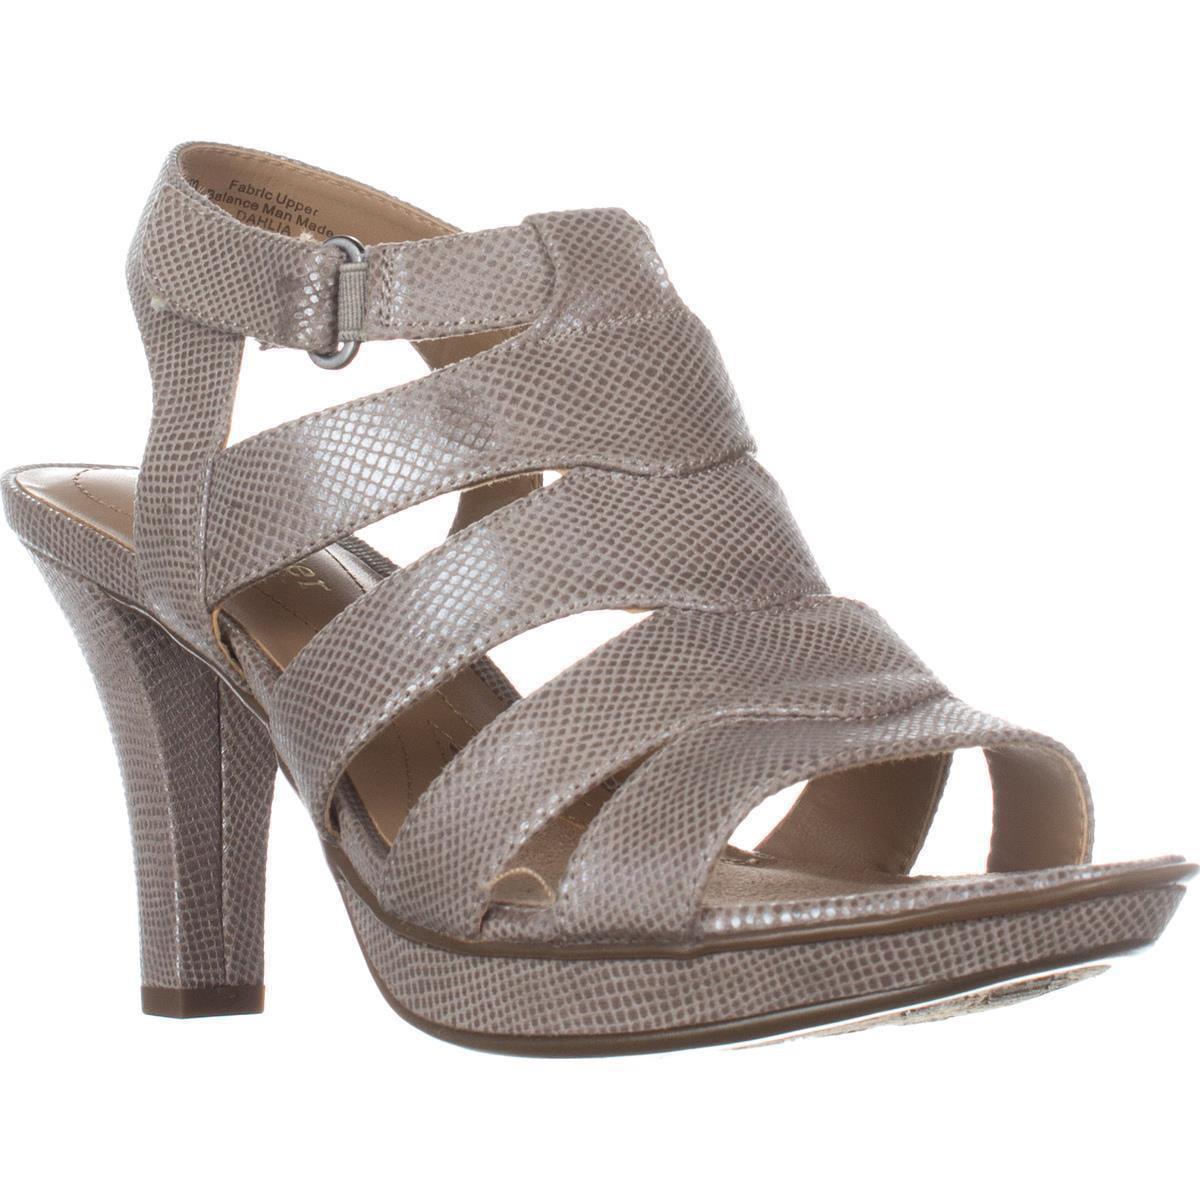 Womens Naturalizer Dahlia Gladiator Sandals, Grey by Naturalizer